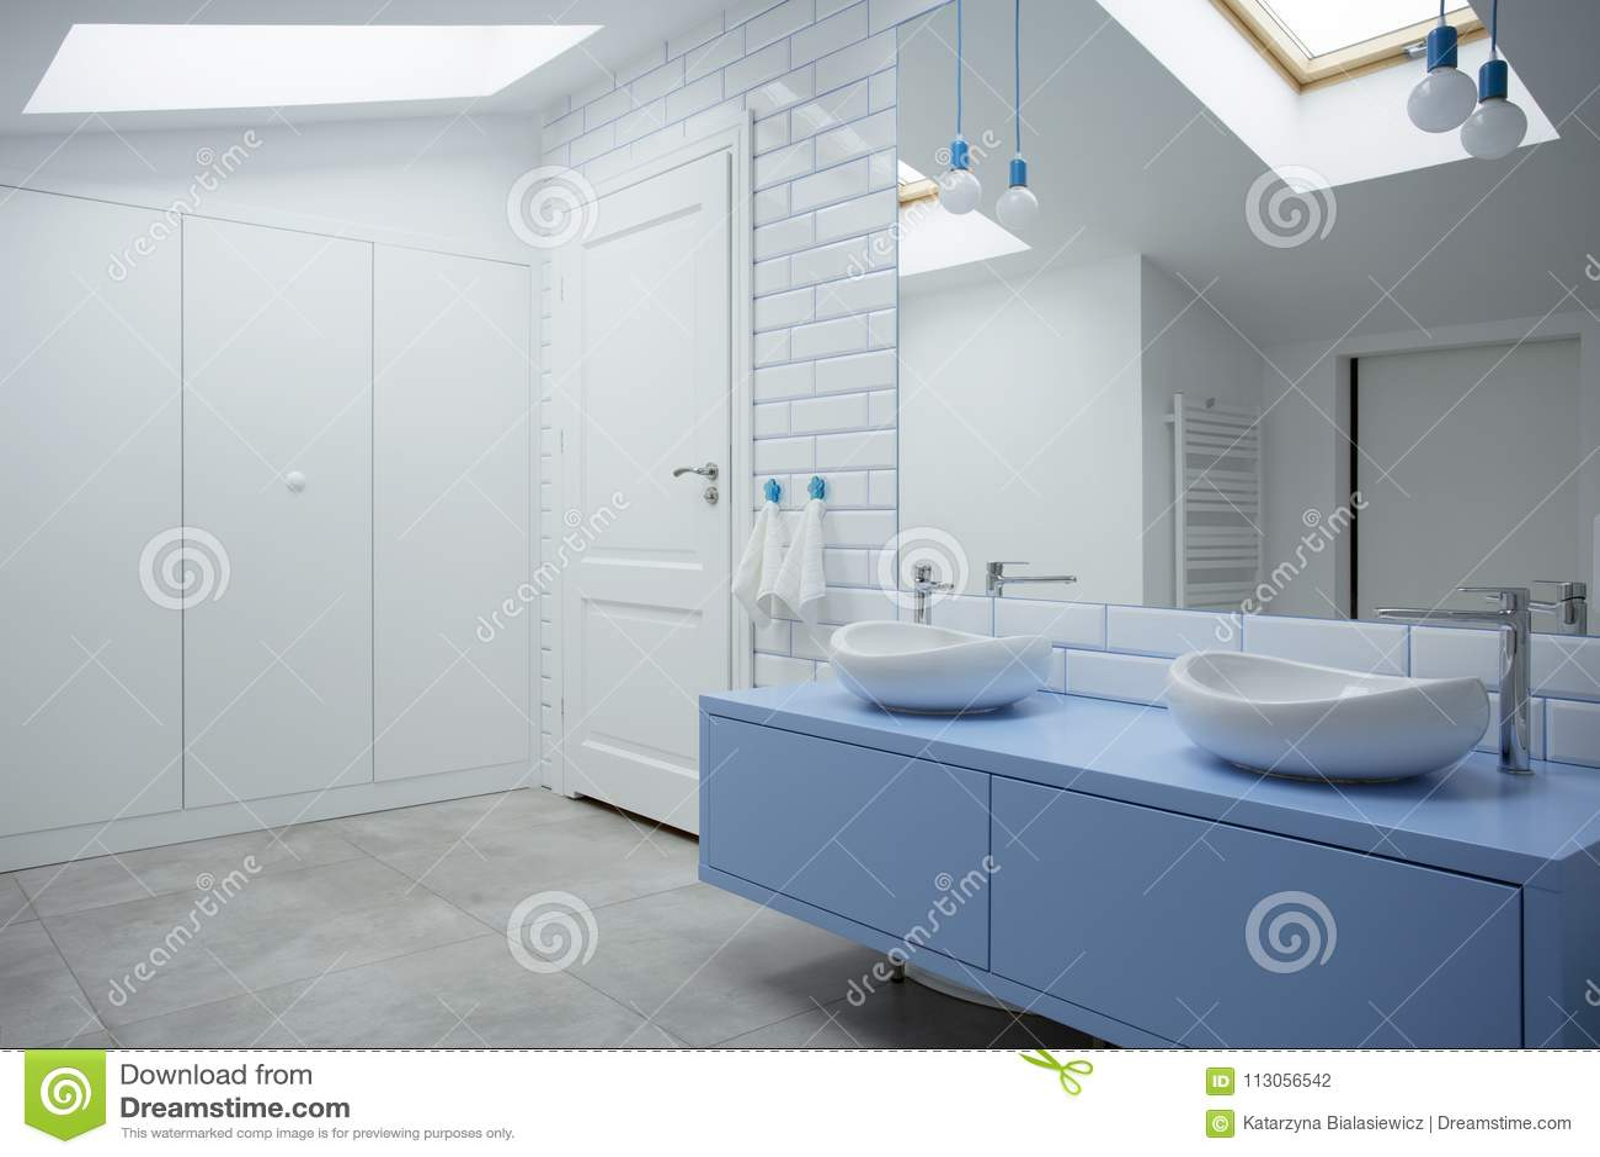 Белый и голубой интерьер ванной комнаты